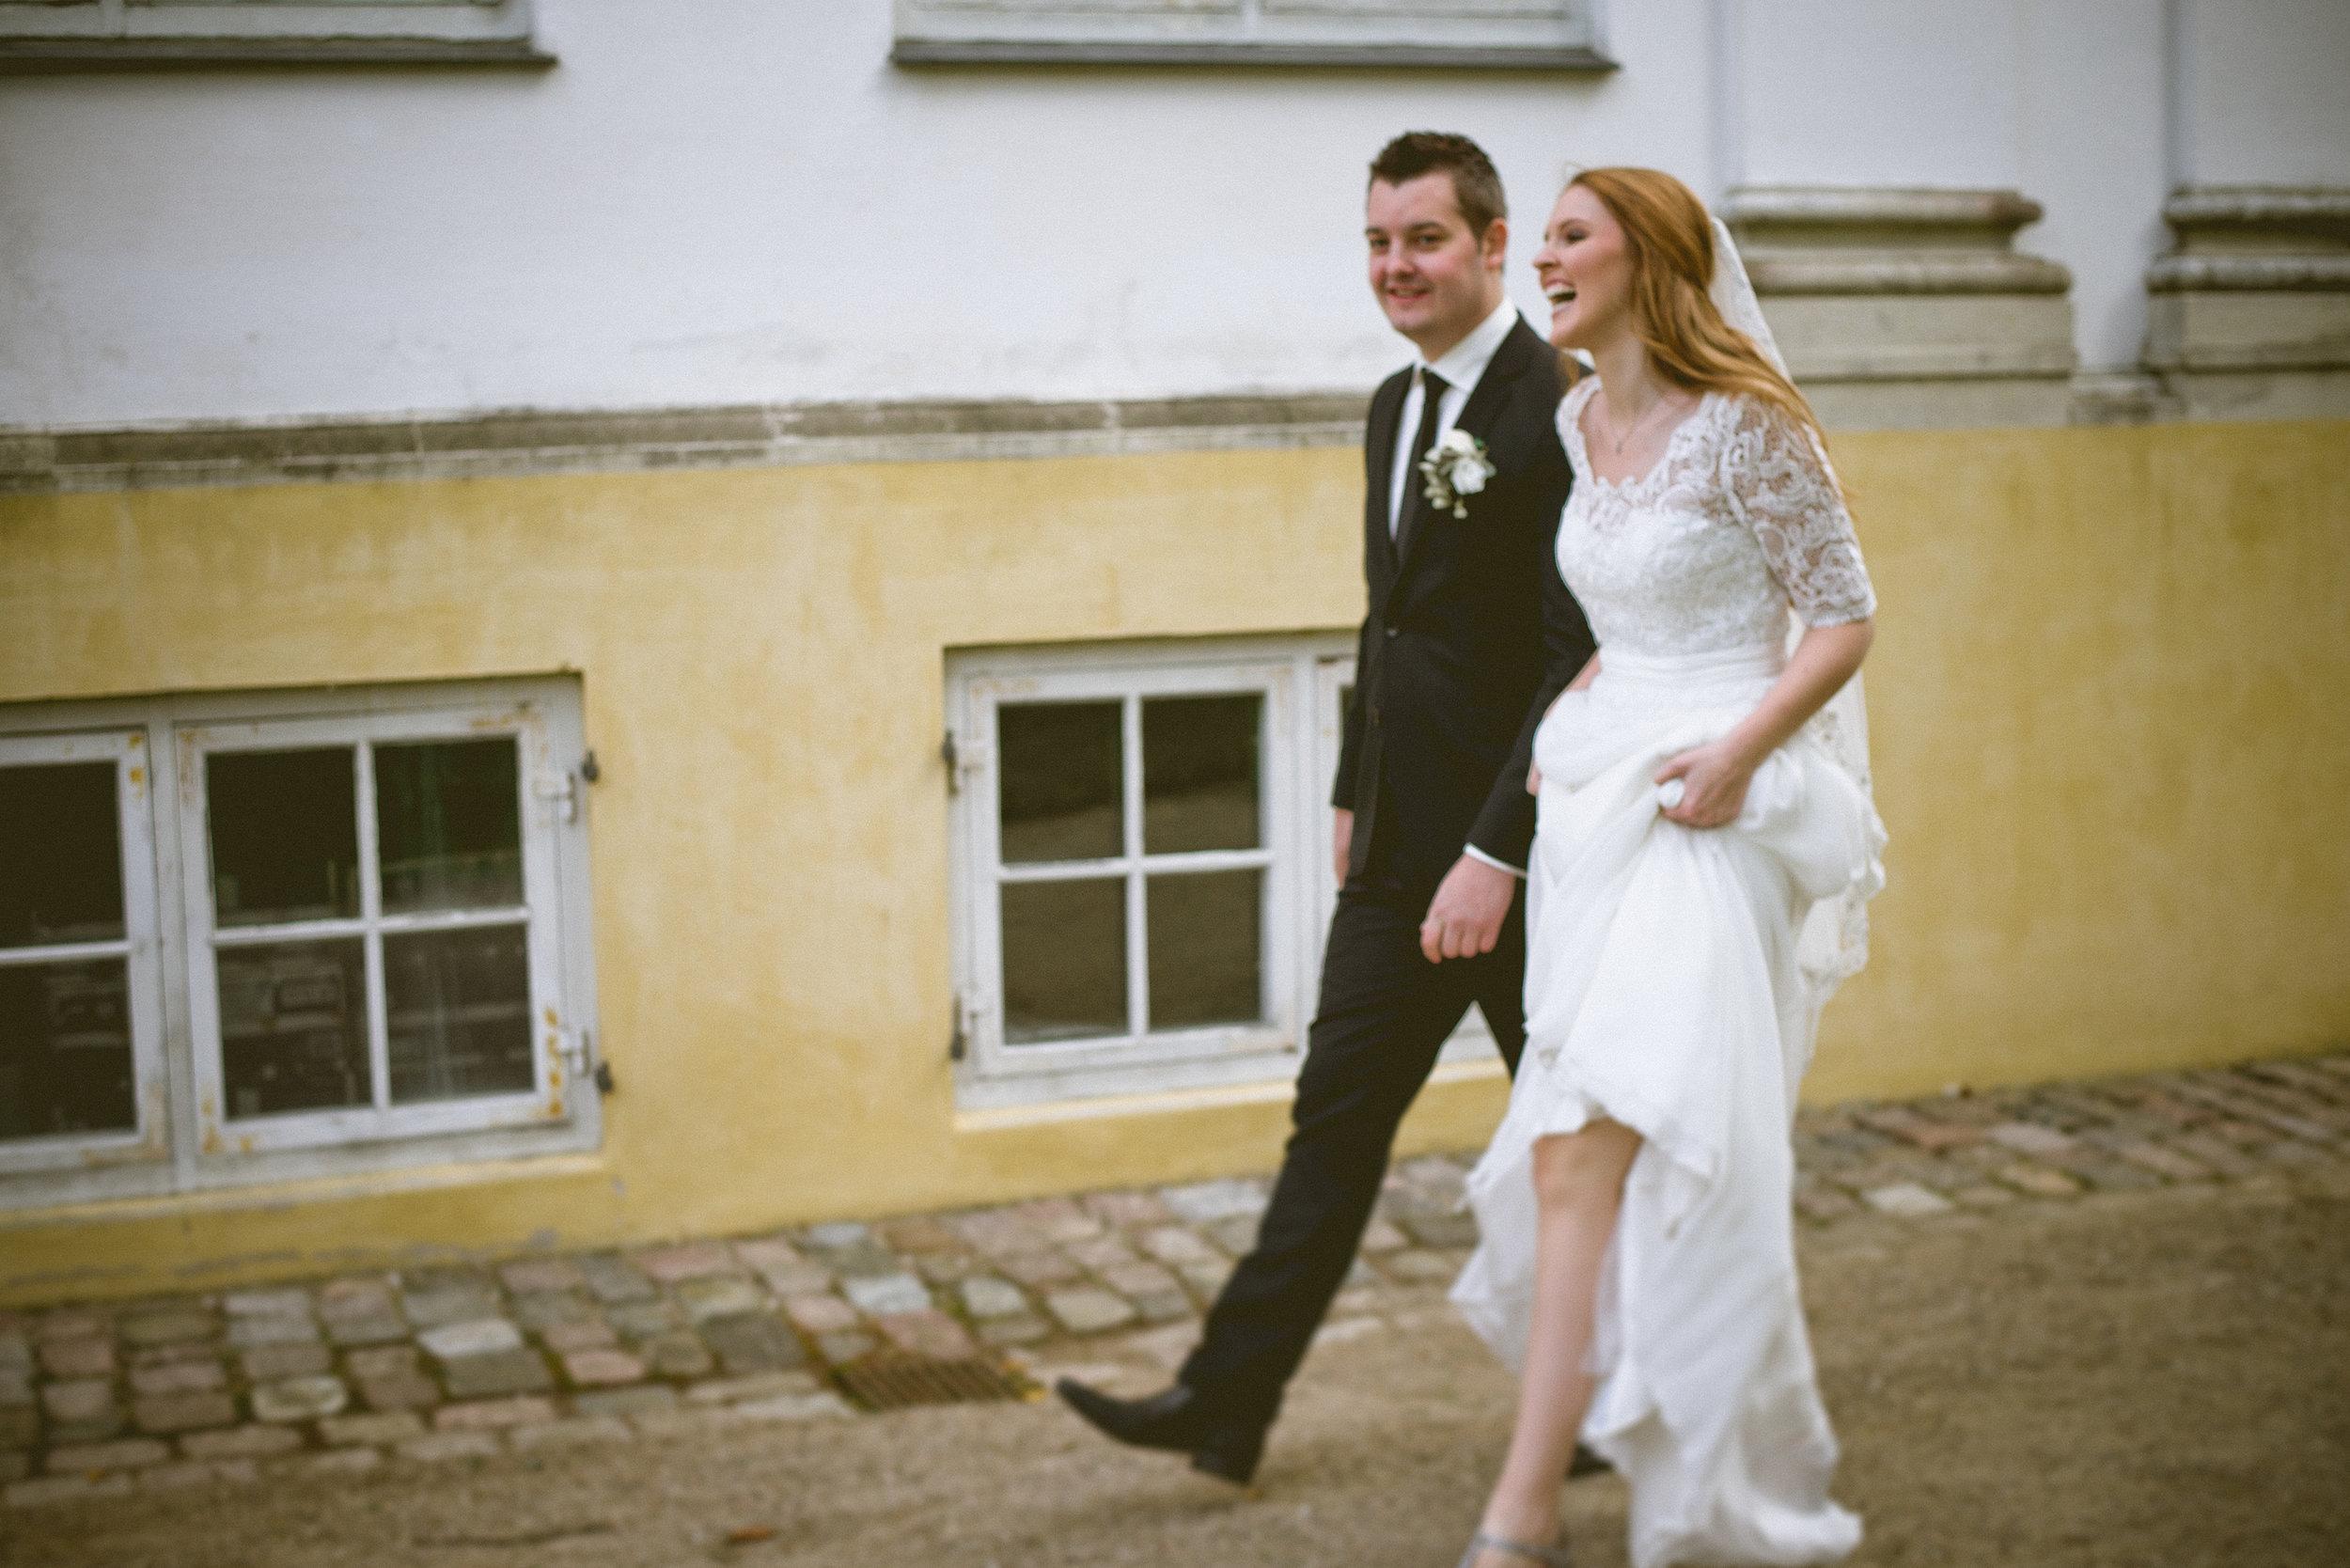 York Region Ontario Wedding Photographer - Bride + Groom-54.jpg